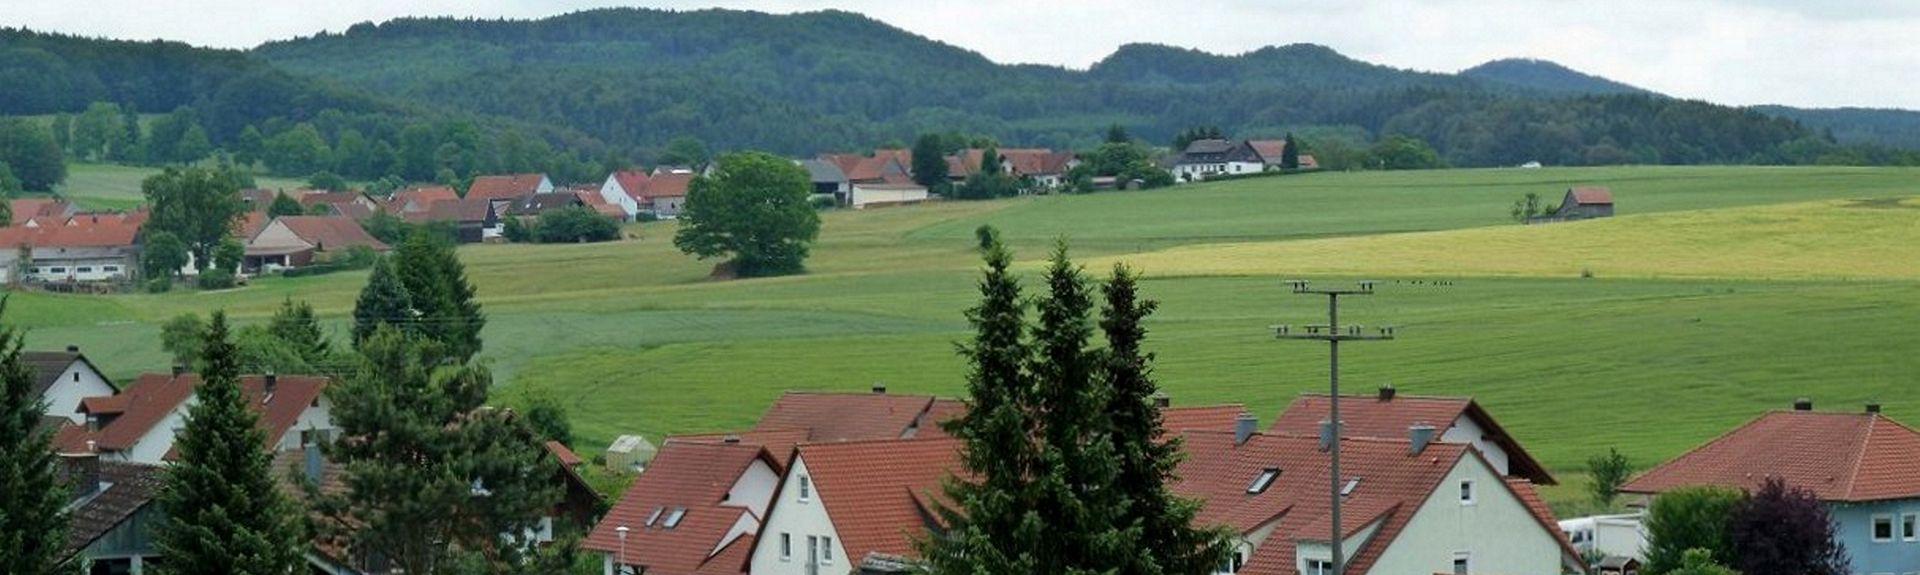 Auerbach i.d.OPf., Bayern, Tyskland